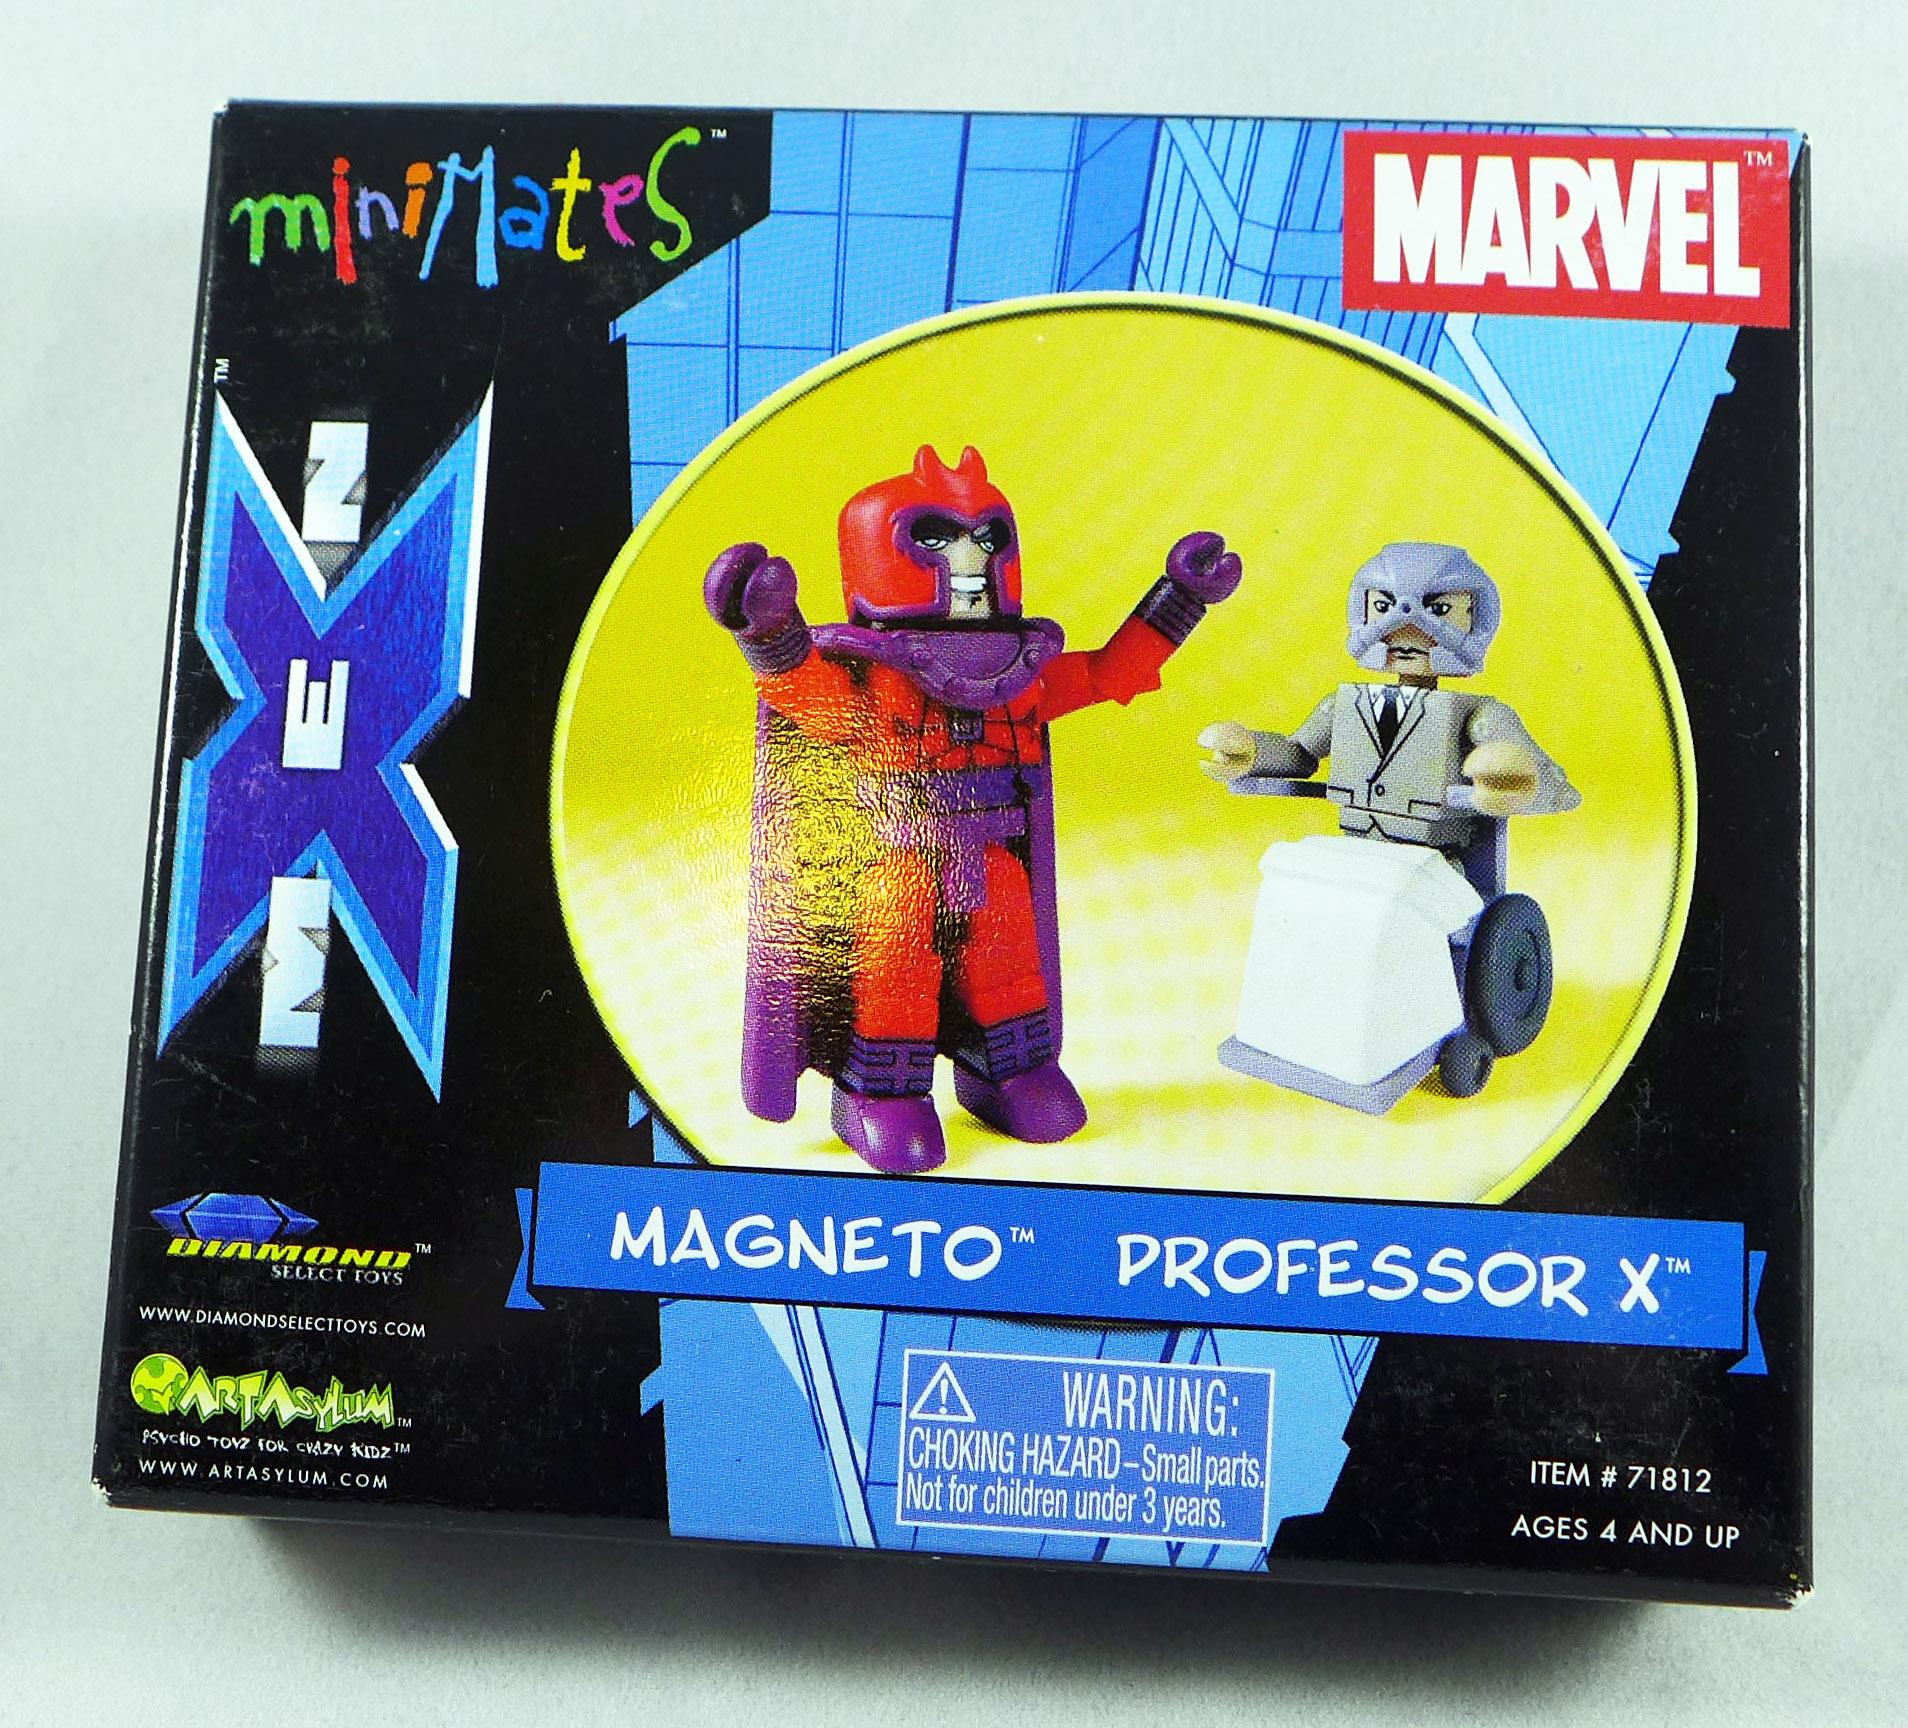 Magneto & Professor X Minimates